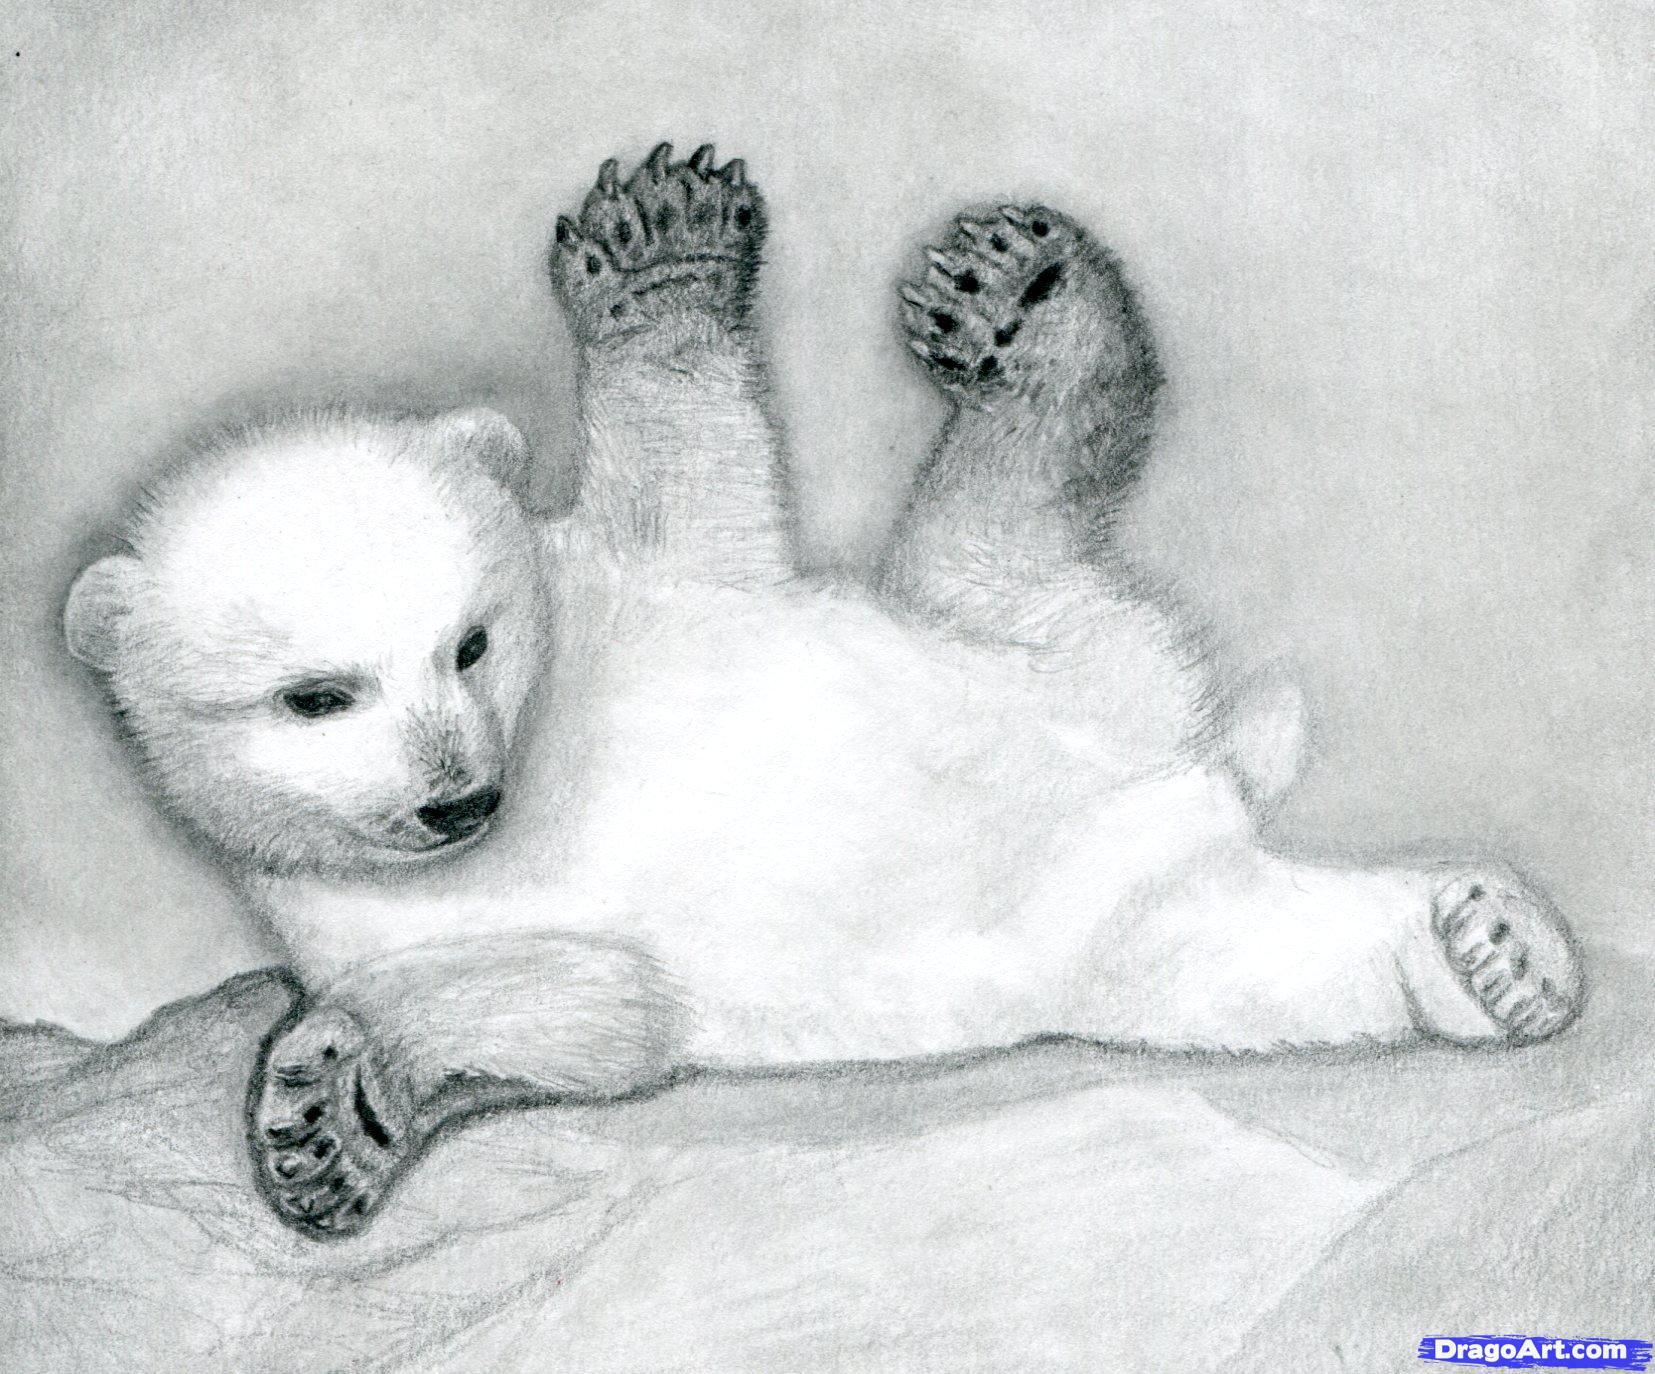 Drawn polar  bear pencil drawing How  a Step cub